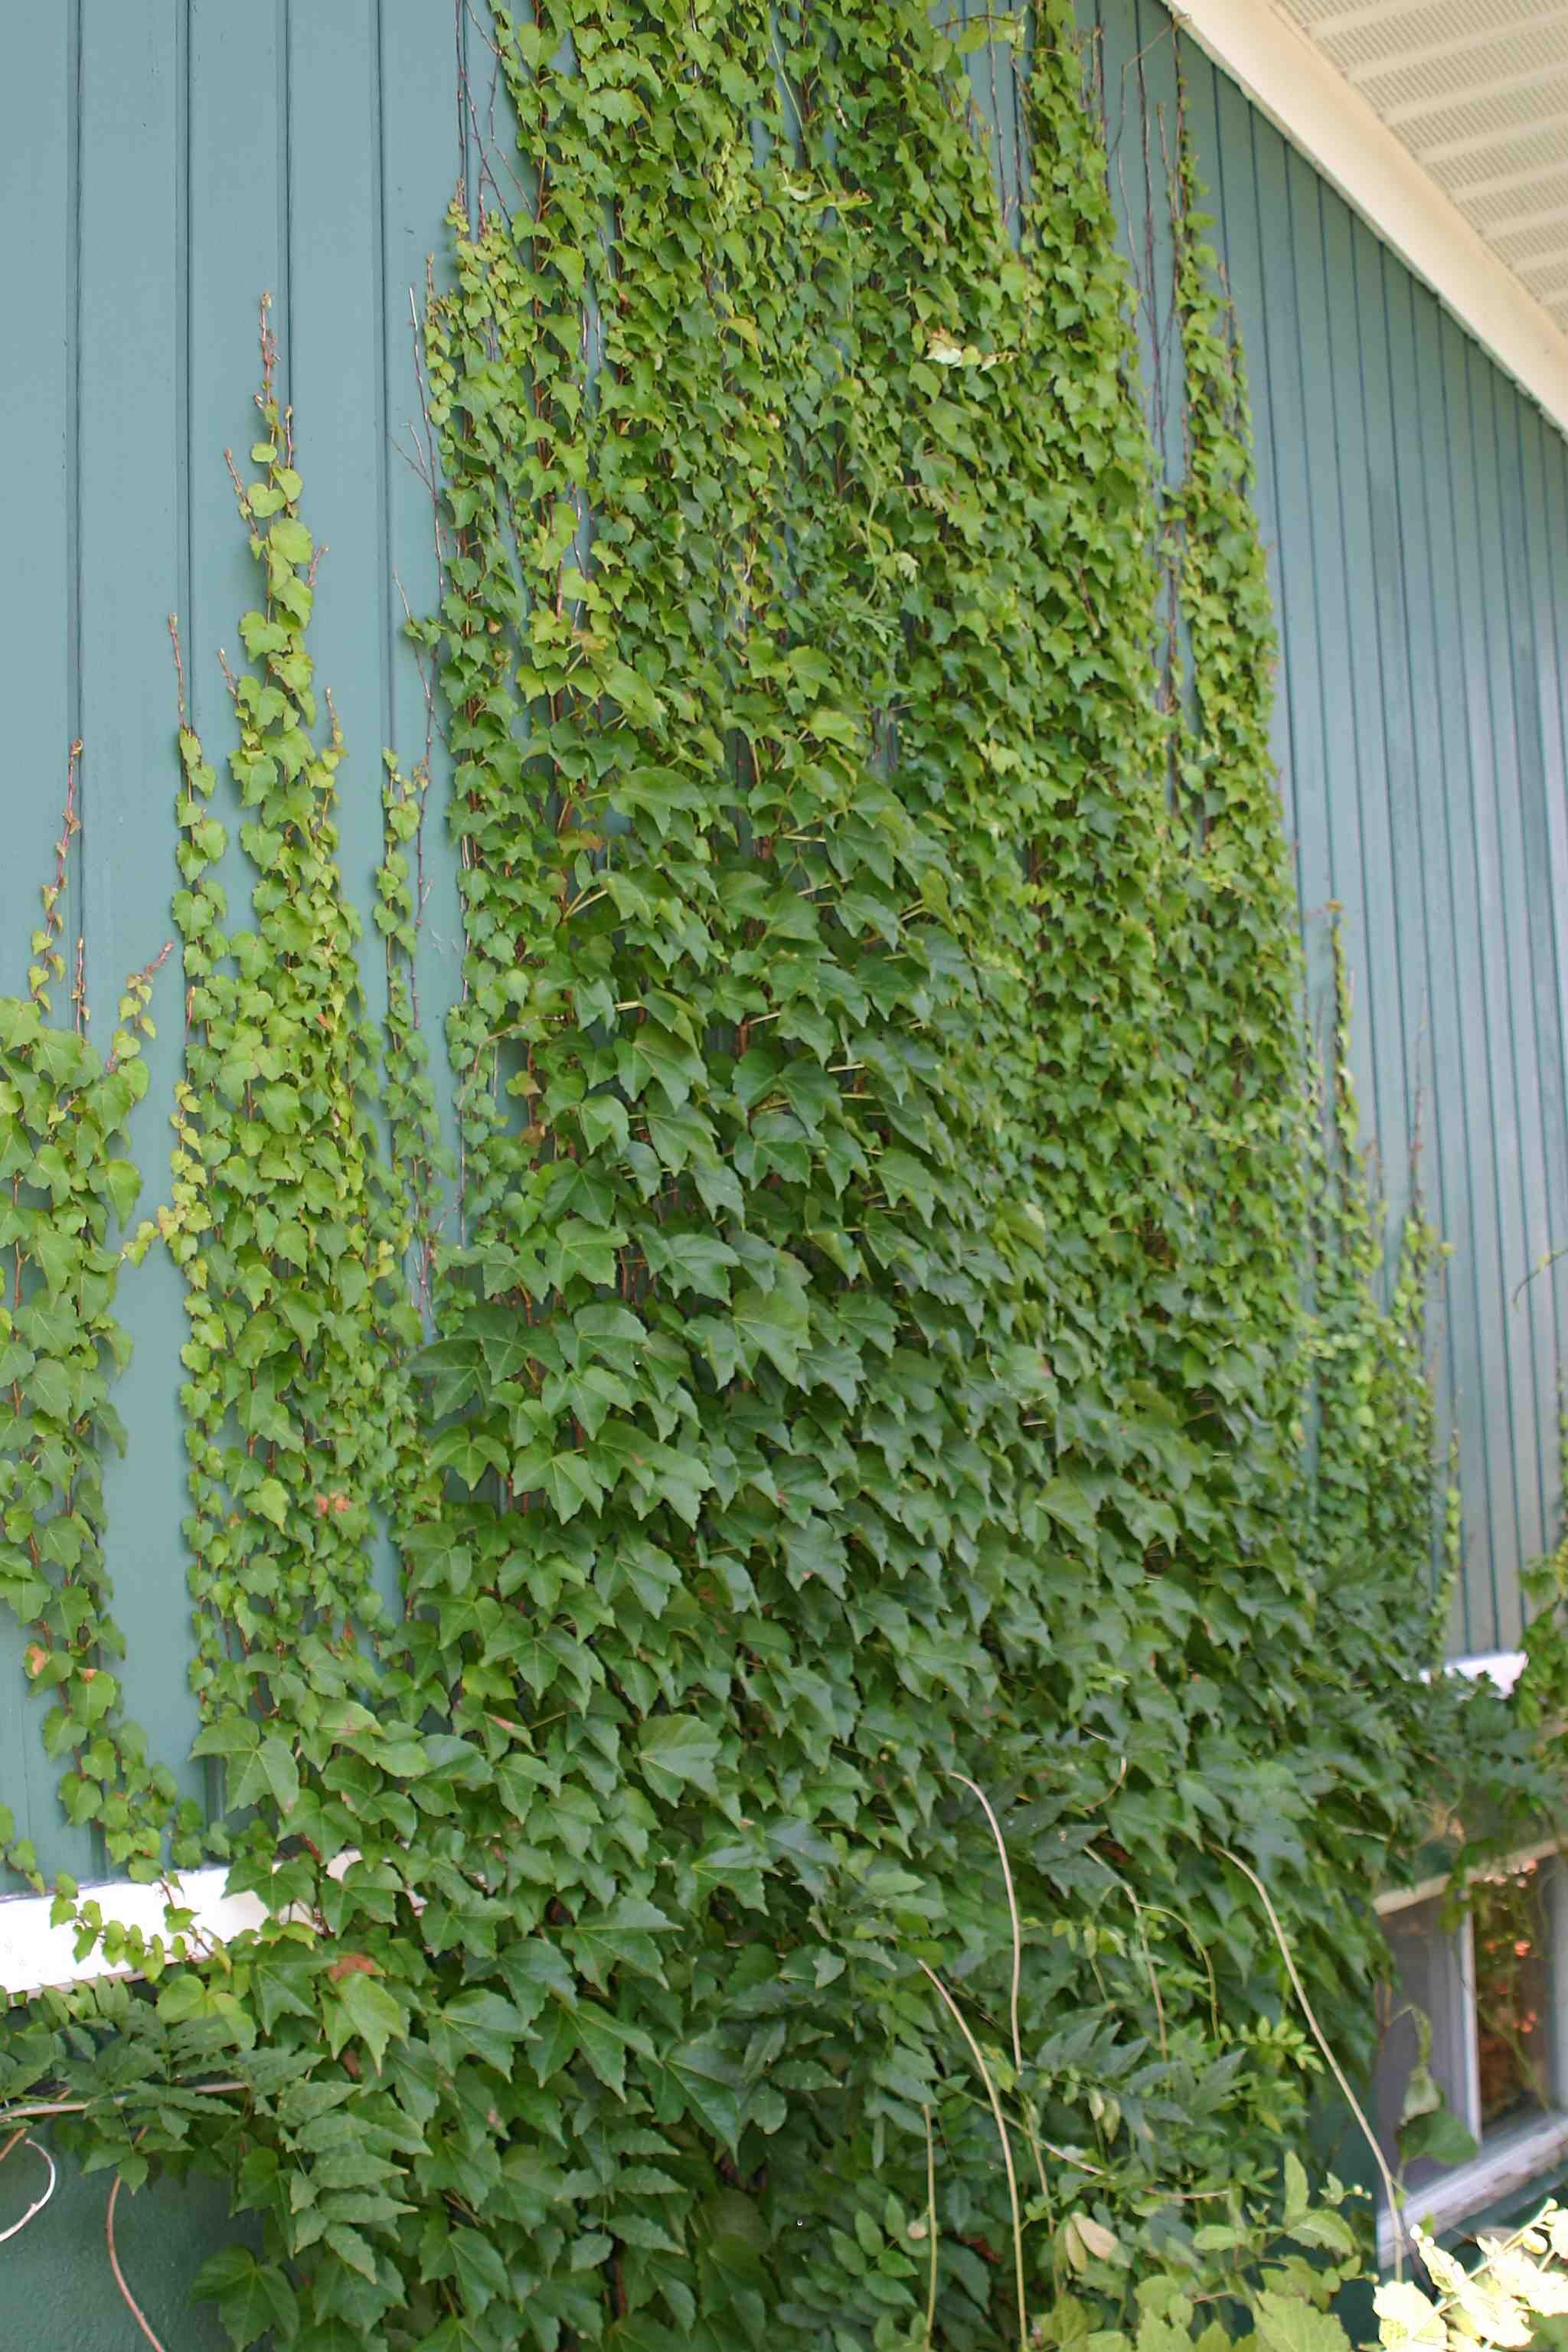 96594106b36937668012e0f87864ef01 - How To Get A Vine To Grow Up A Wall